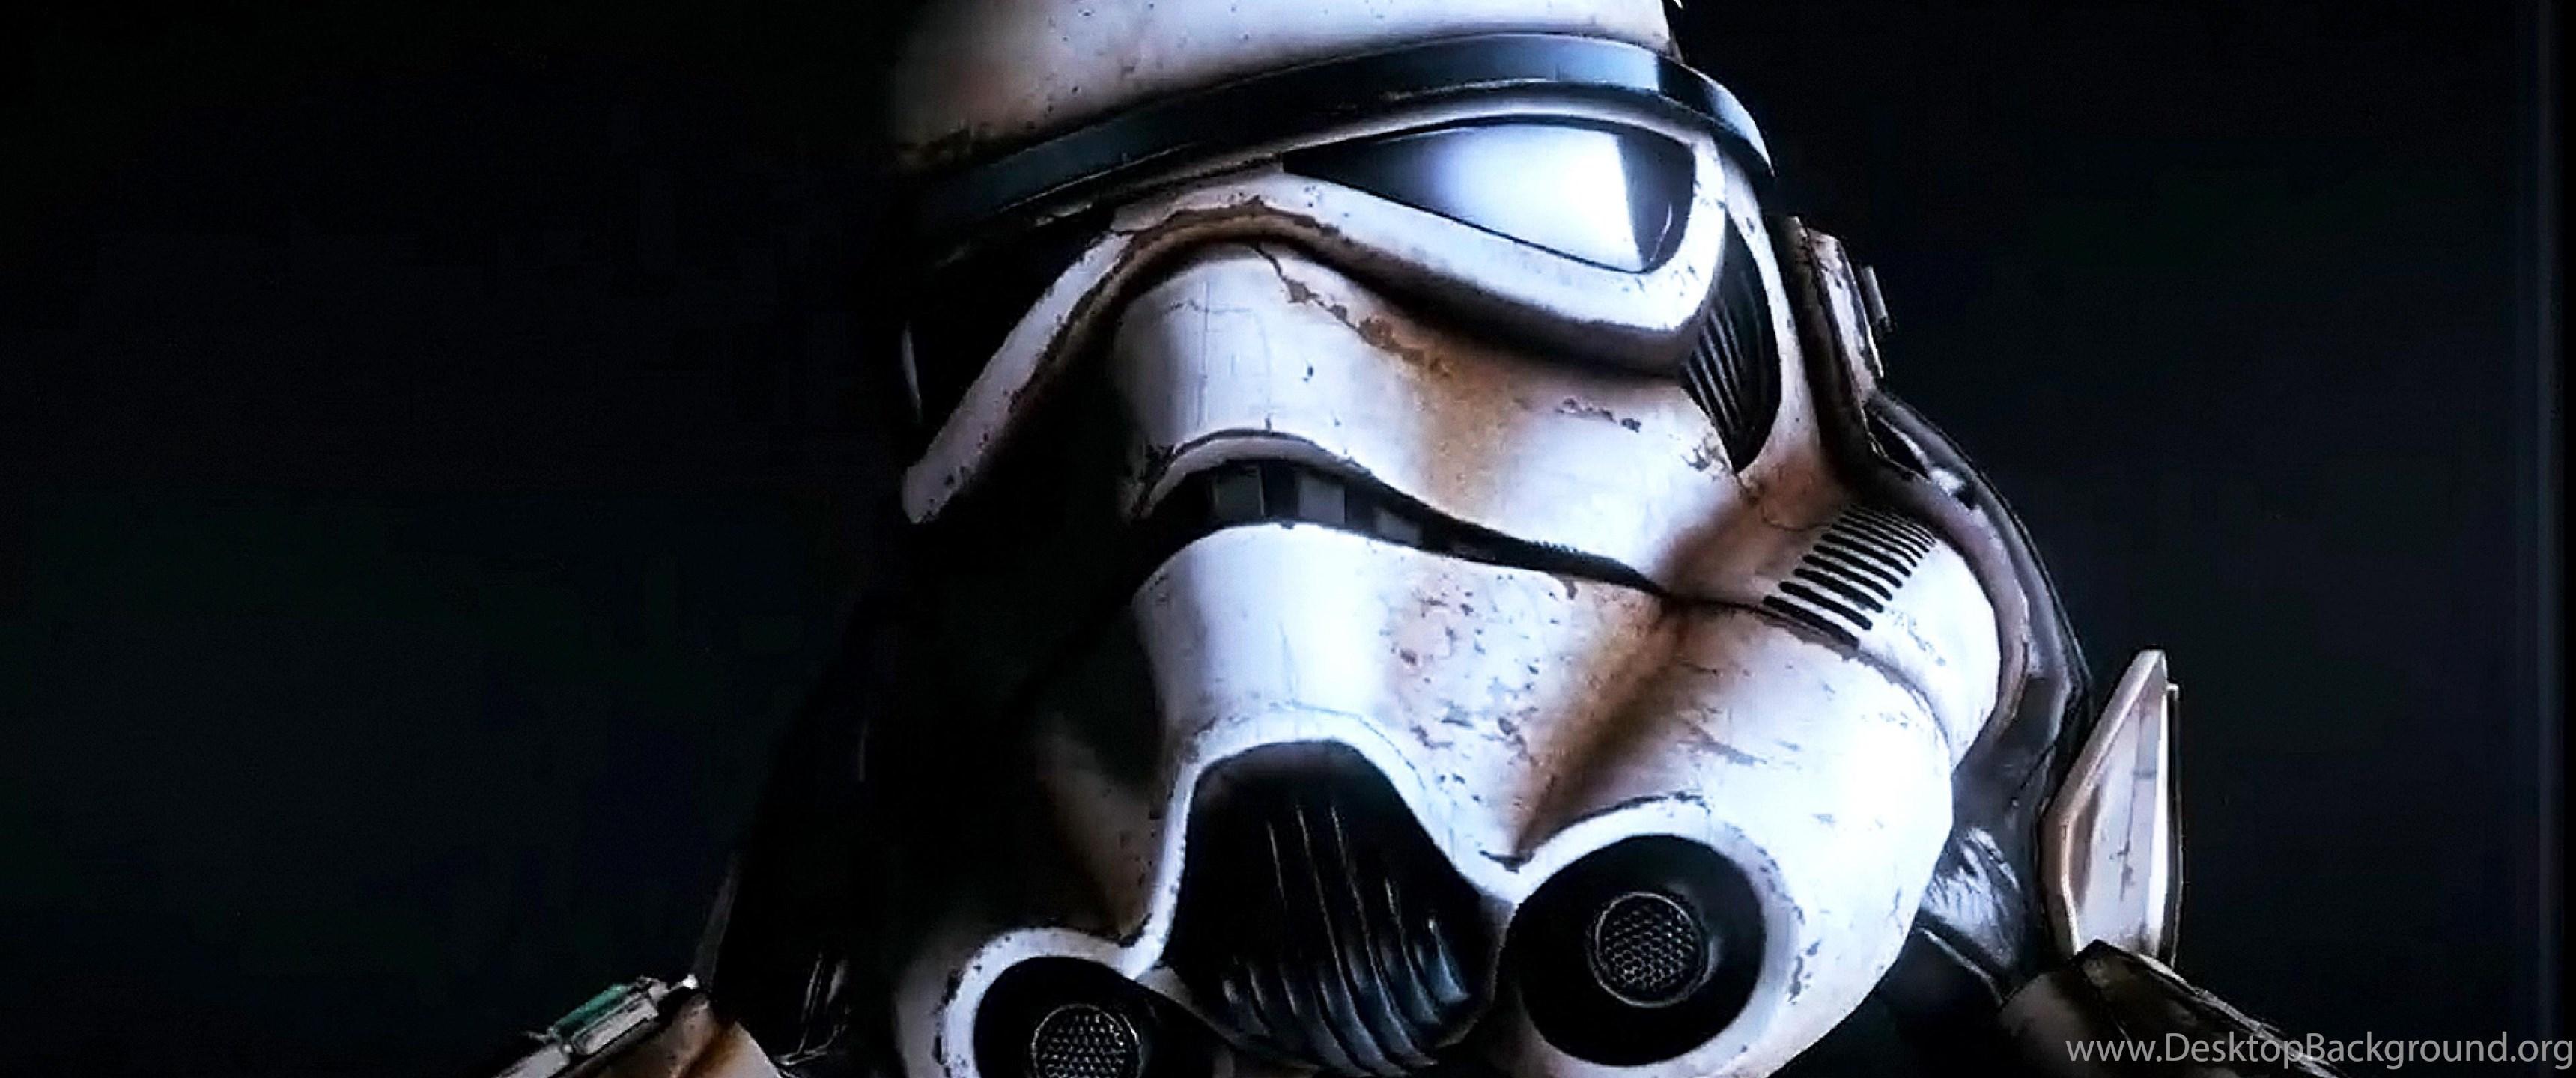 3440x1440 Wallpaper Star Wars: Star Wars Storm Trooper Wallpapers » Wallpapers HD Desktop